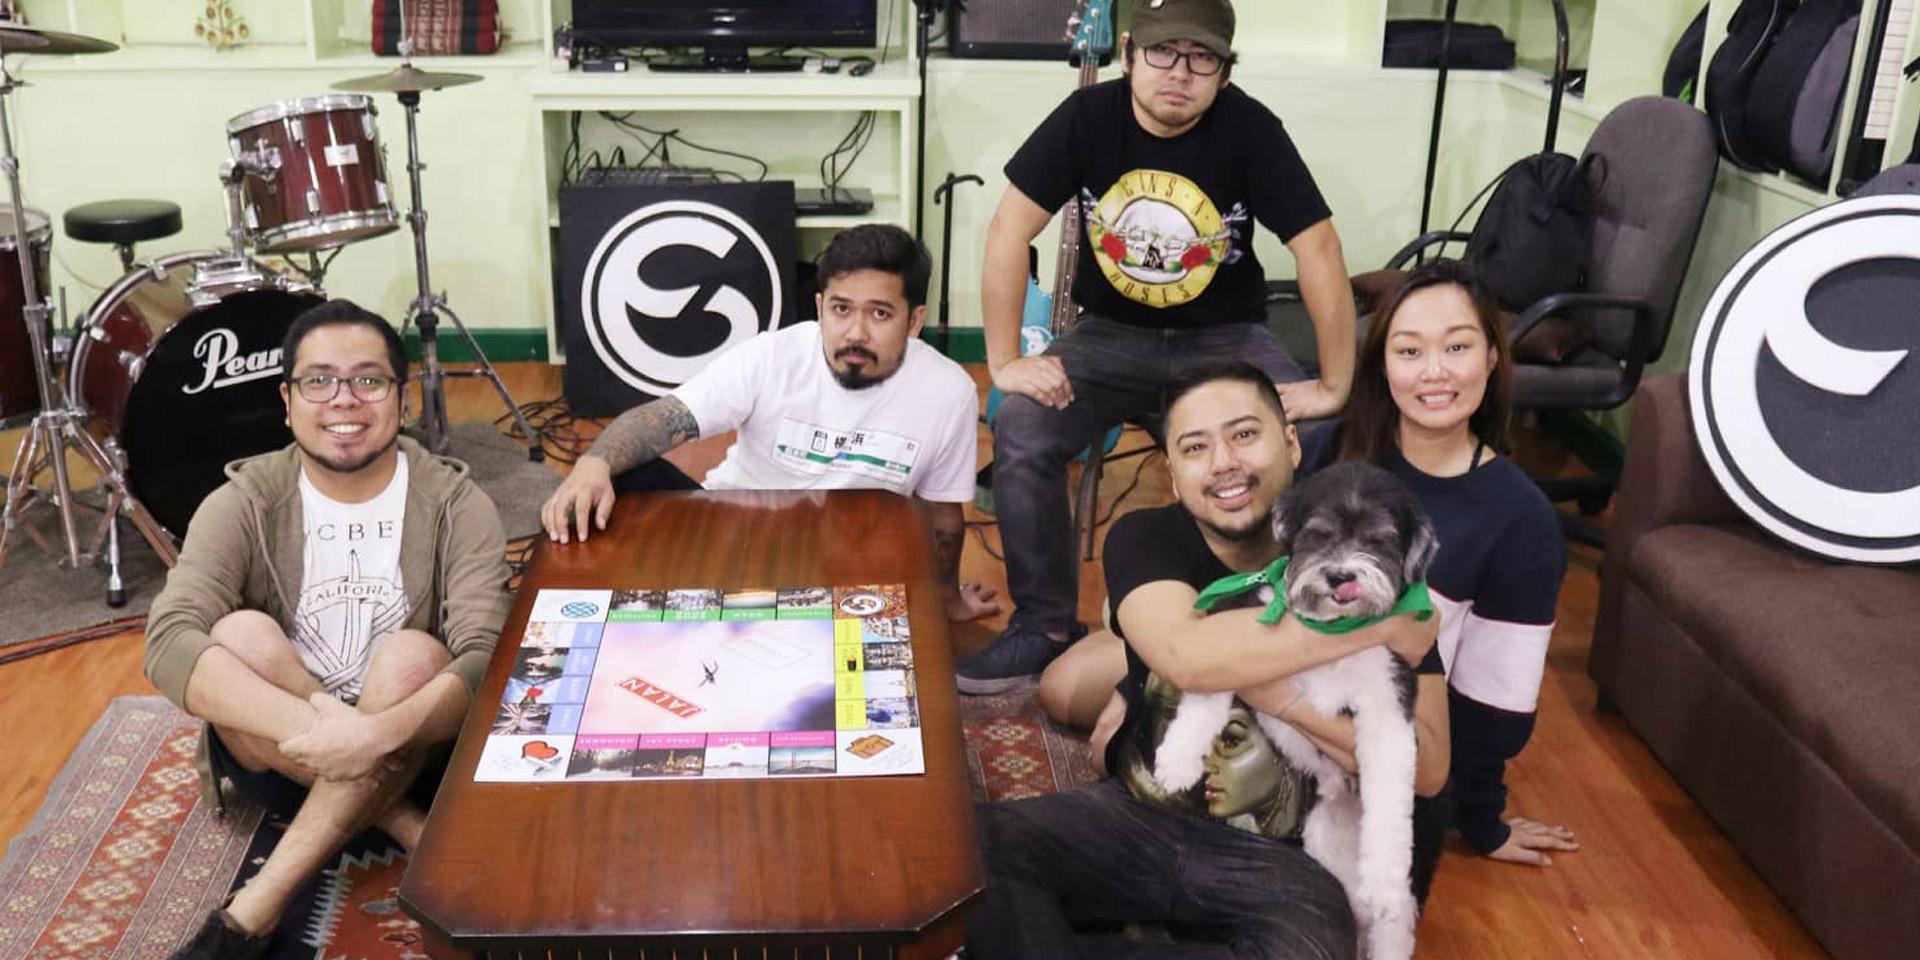 Signalgiant release colorful new single 'Jalan' – listen